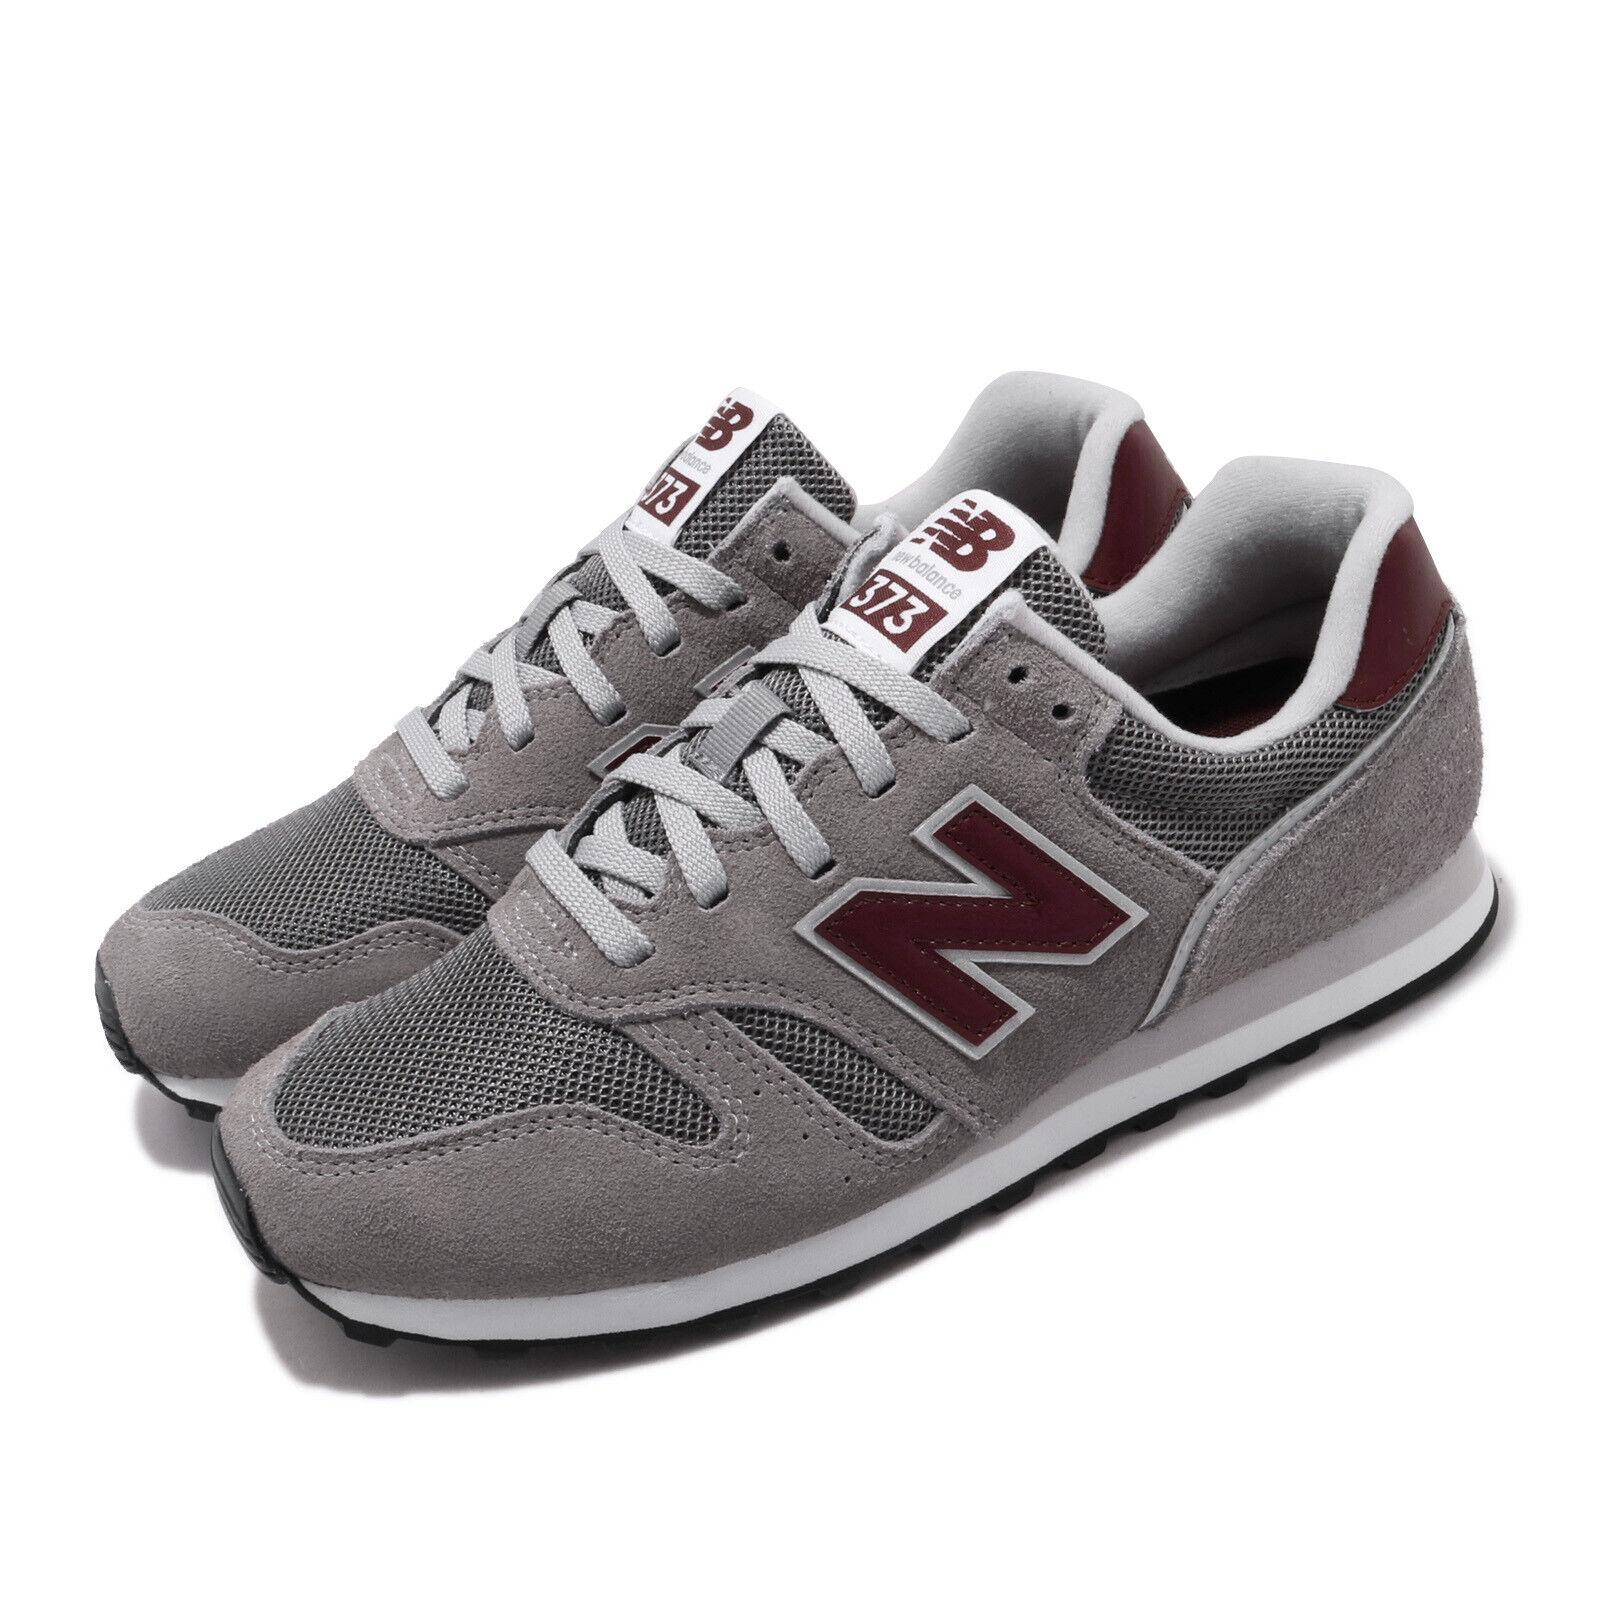 New Balance 373 Grey Suede Burgundy Men Women Retro Running Shoes ML373AD2 D